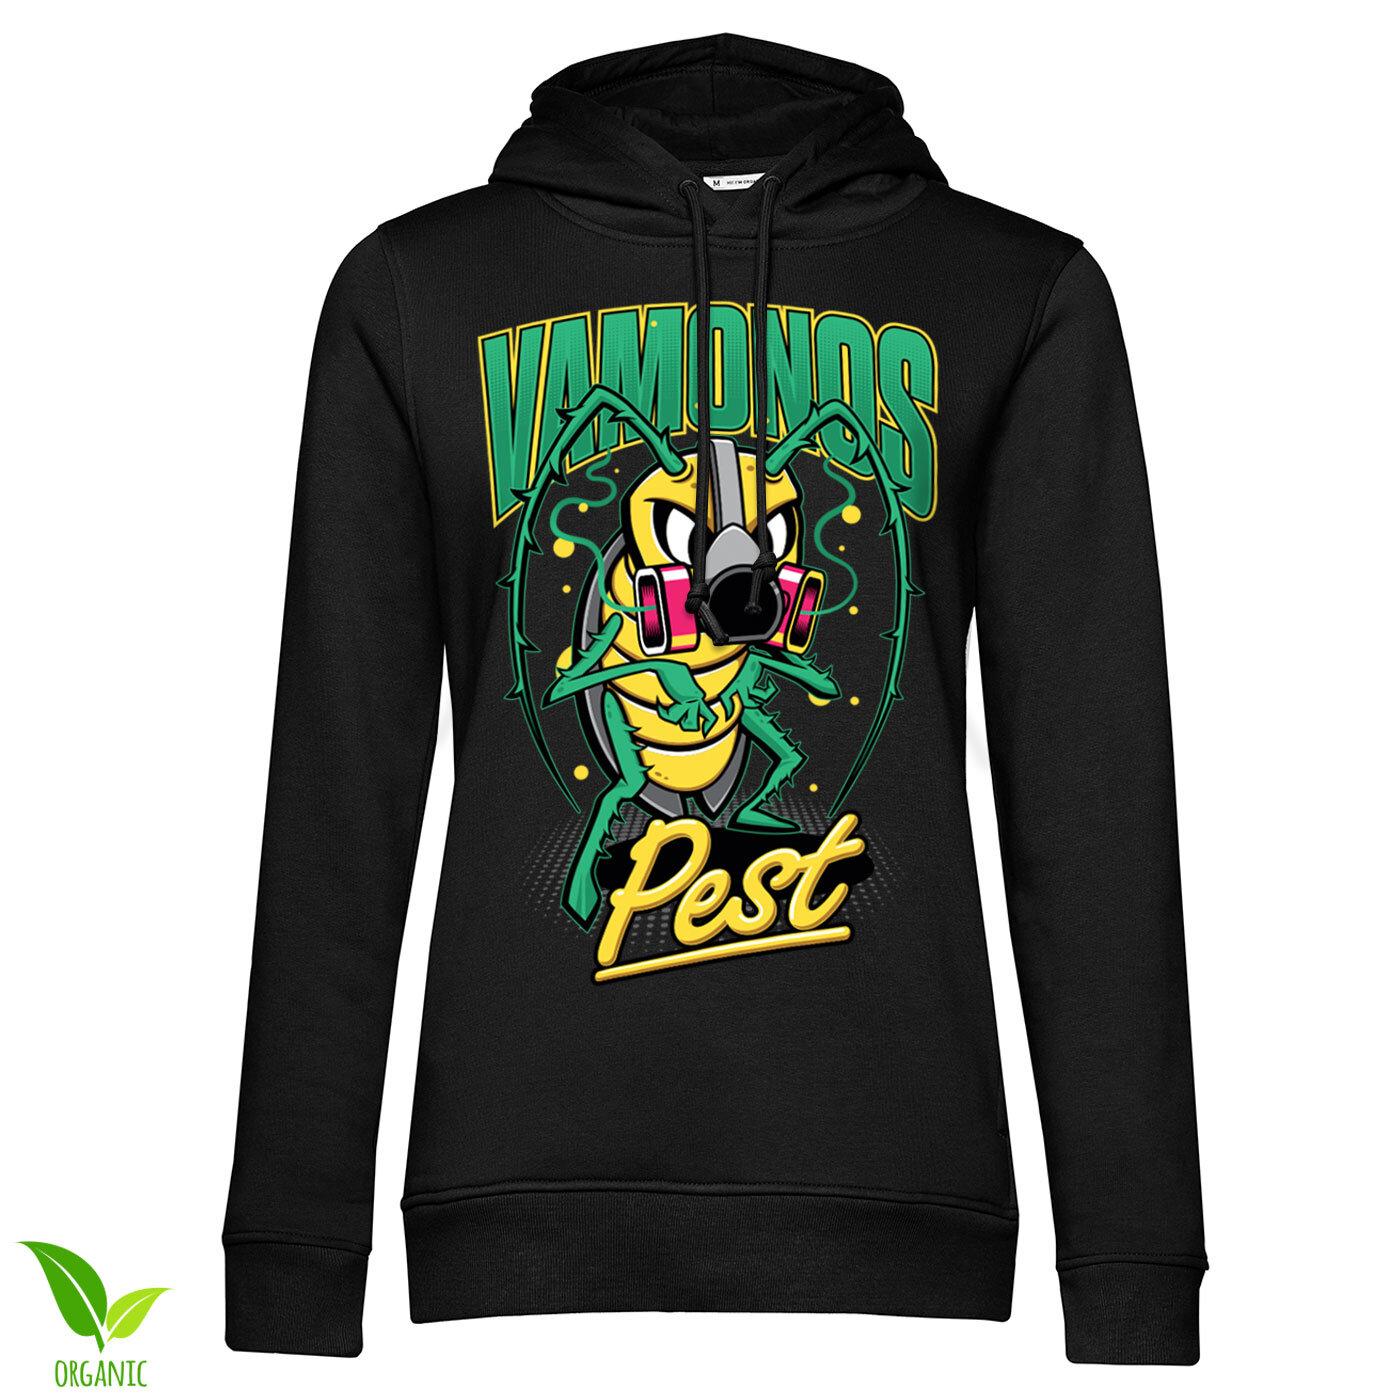 Breaking Bad - Vamanos Pest Bug Girls Hoodie